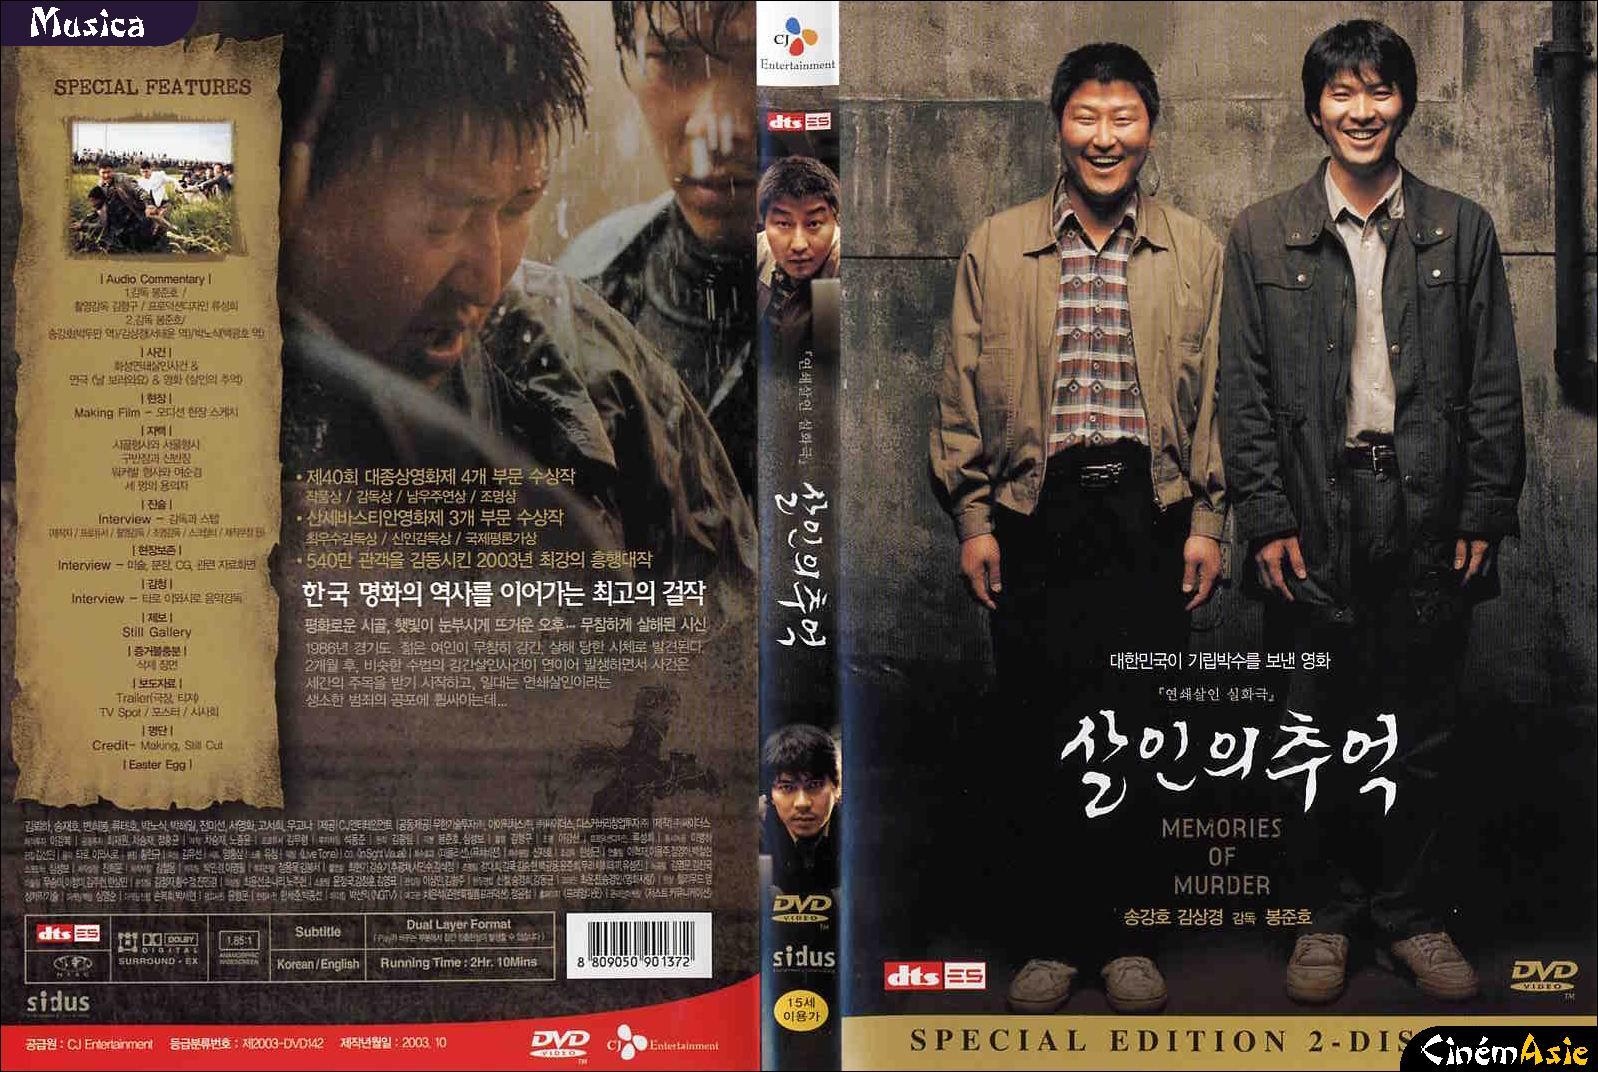 Memories-of-Murder-Salinui-chueok-dvd-cover